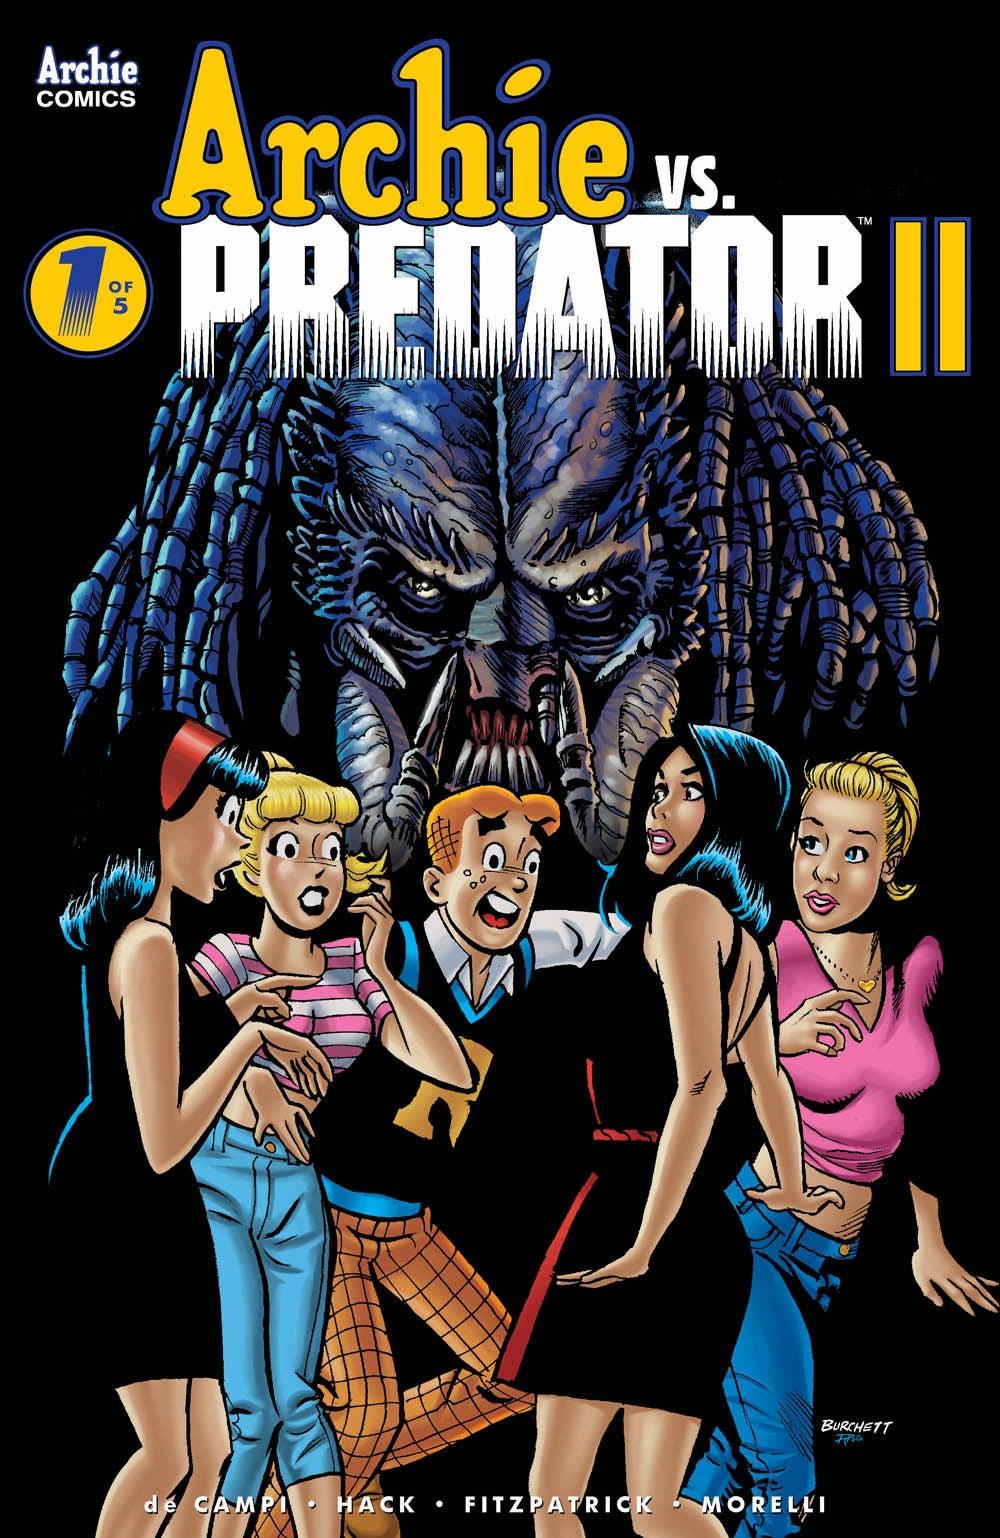 Image: Rick Burchett, Archie Comics